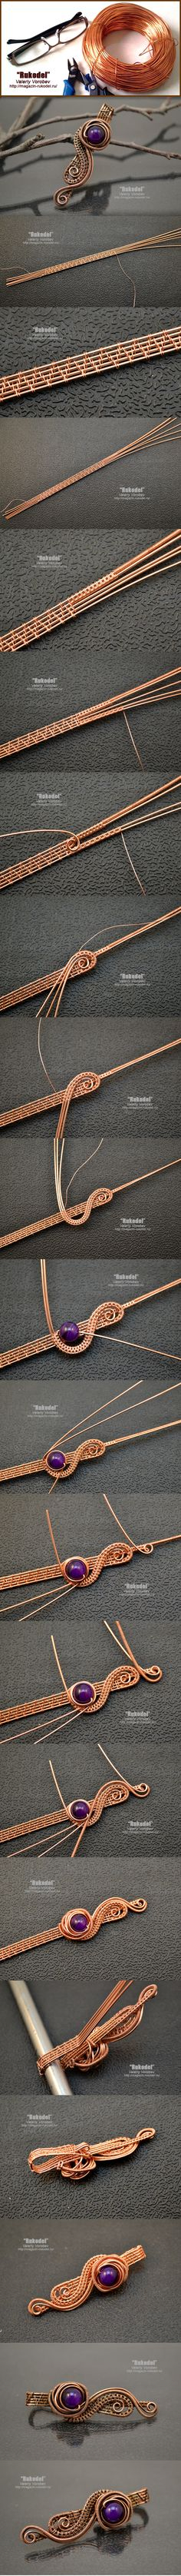 Wire Wrap Pendant - tutorial - http://magazin-rukodel.ru/